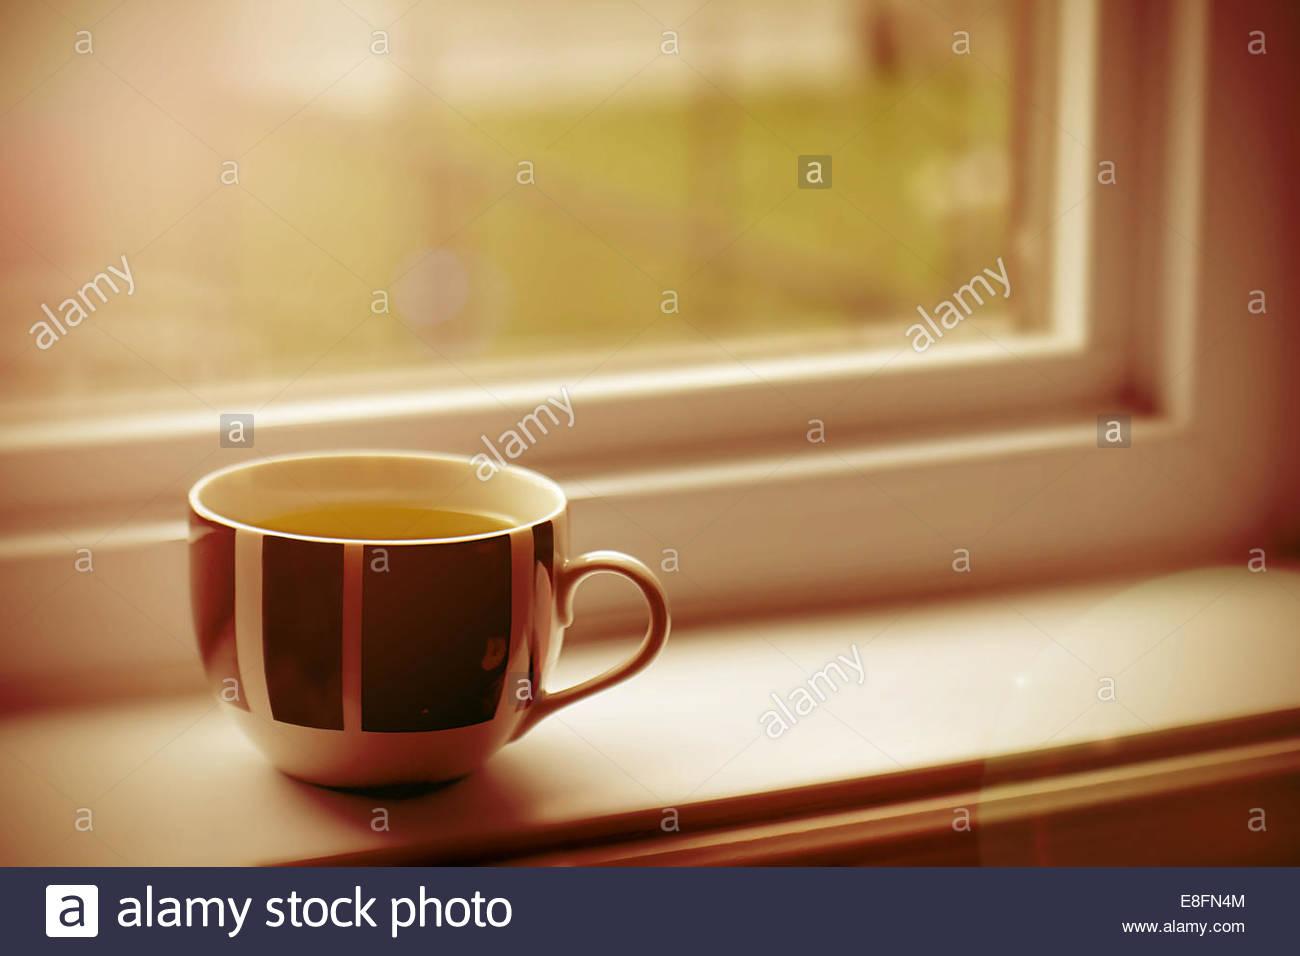 Cup am Fensterbrett Stockbild